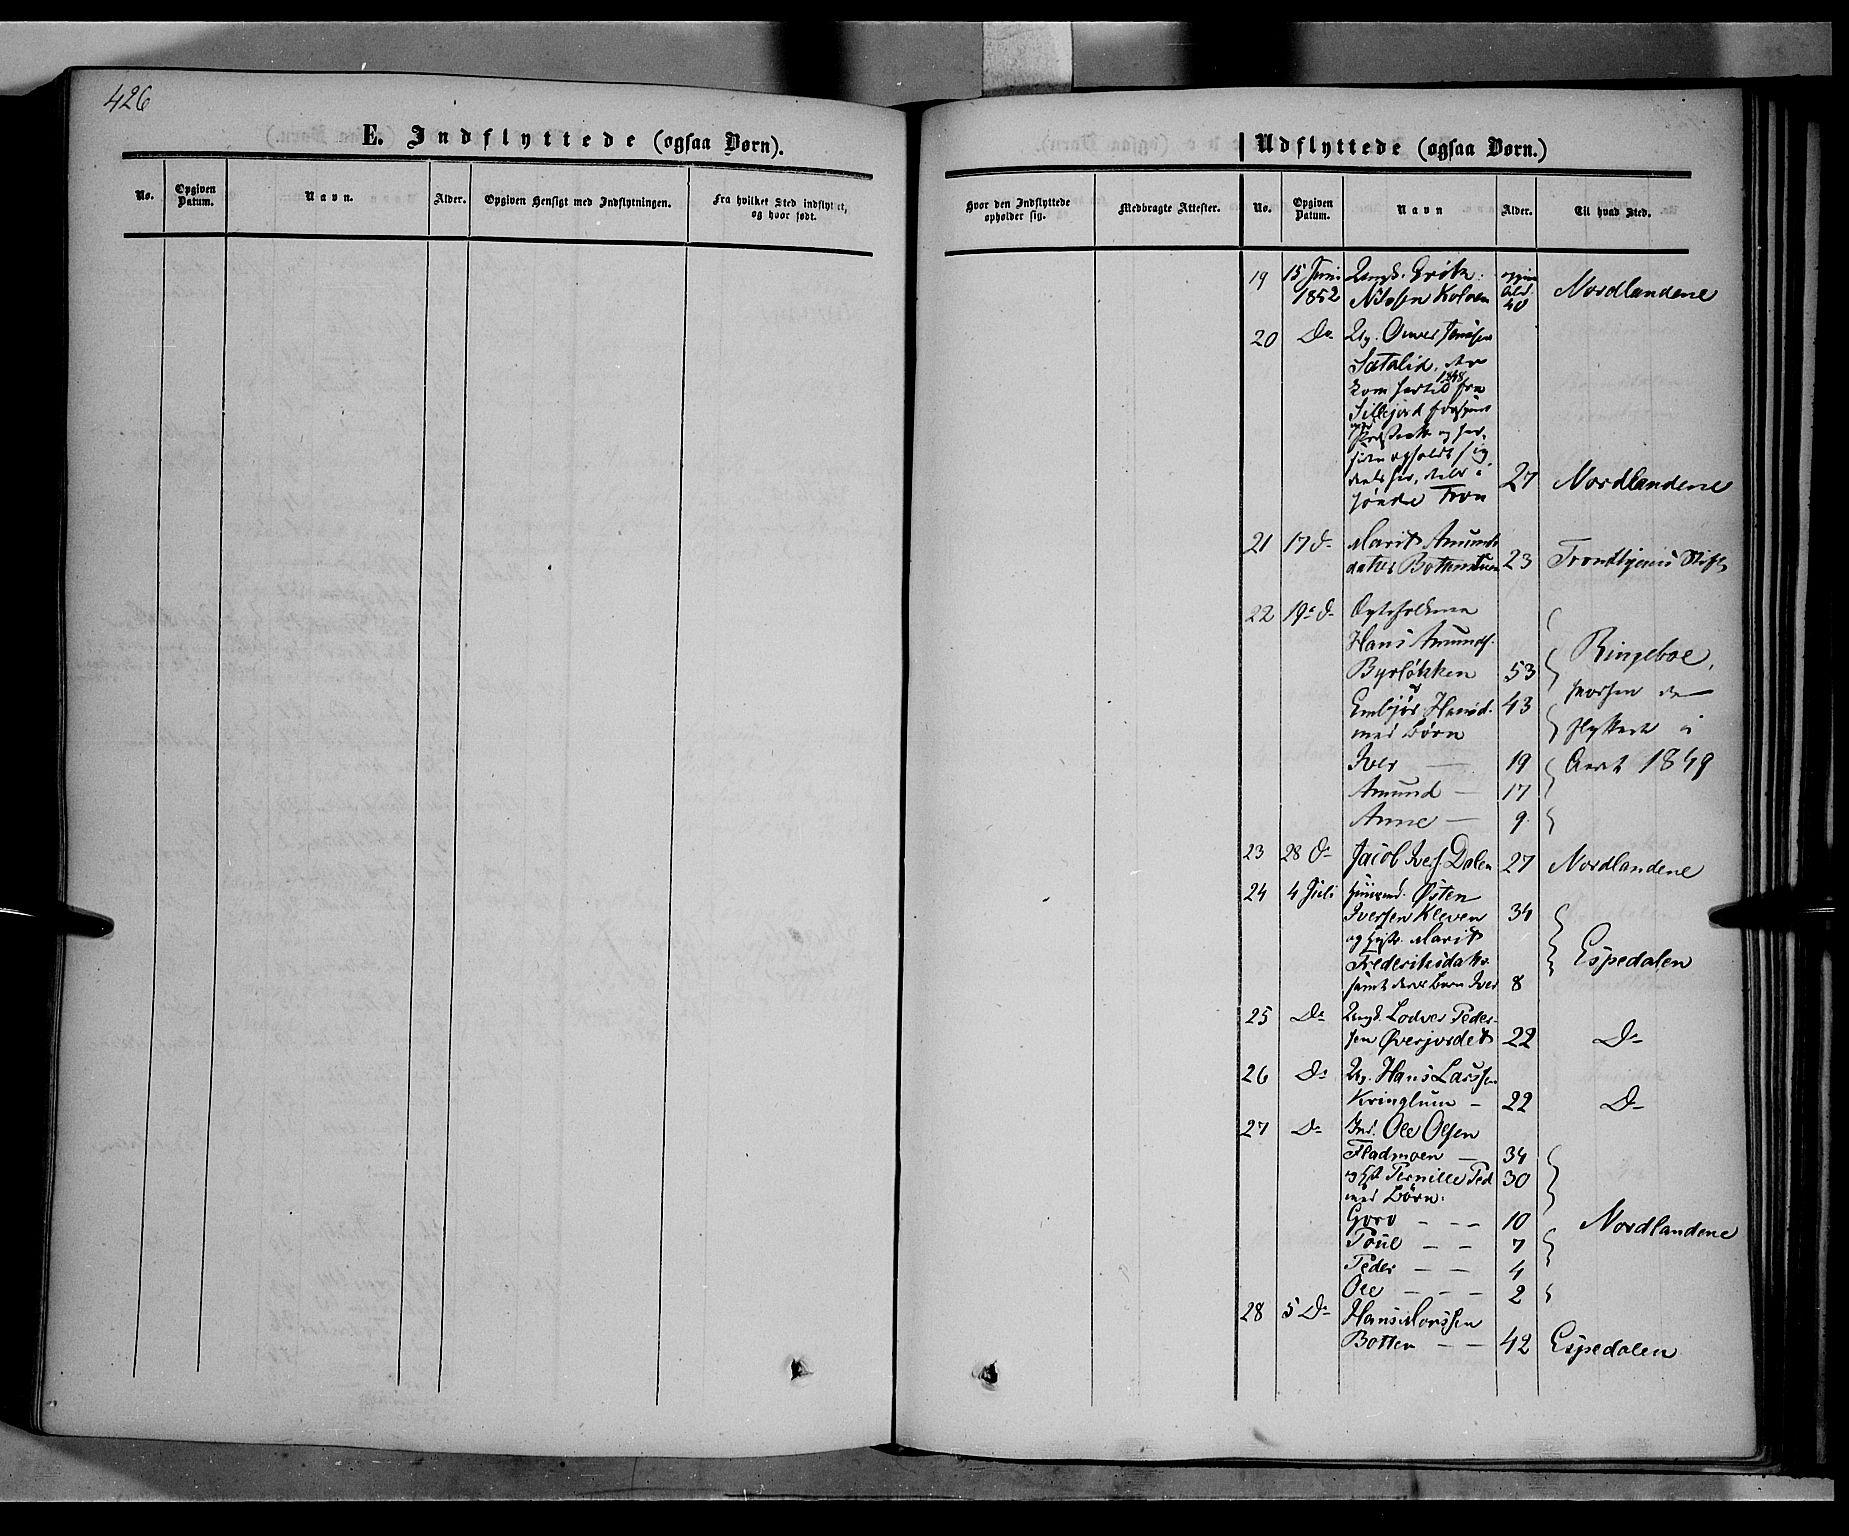 SAH, Nord-Fron prestekontor, Ministerialbok nr. 1, 1851-1864, s. 426